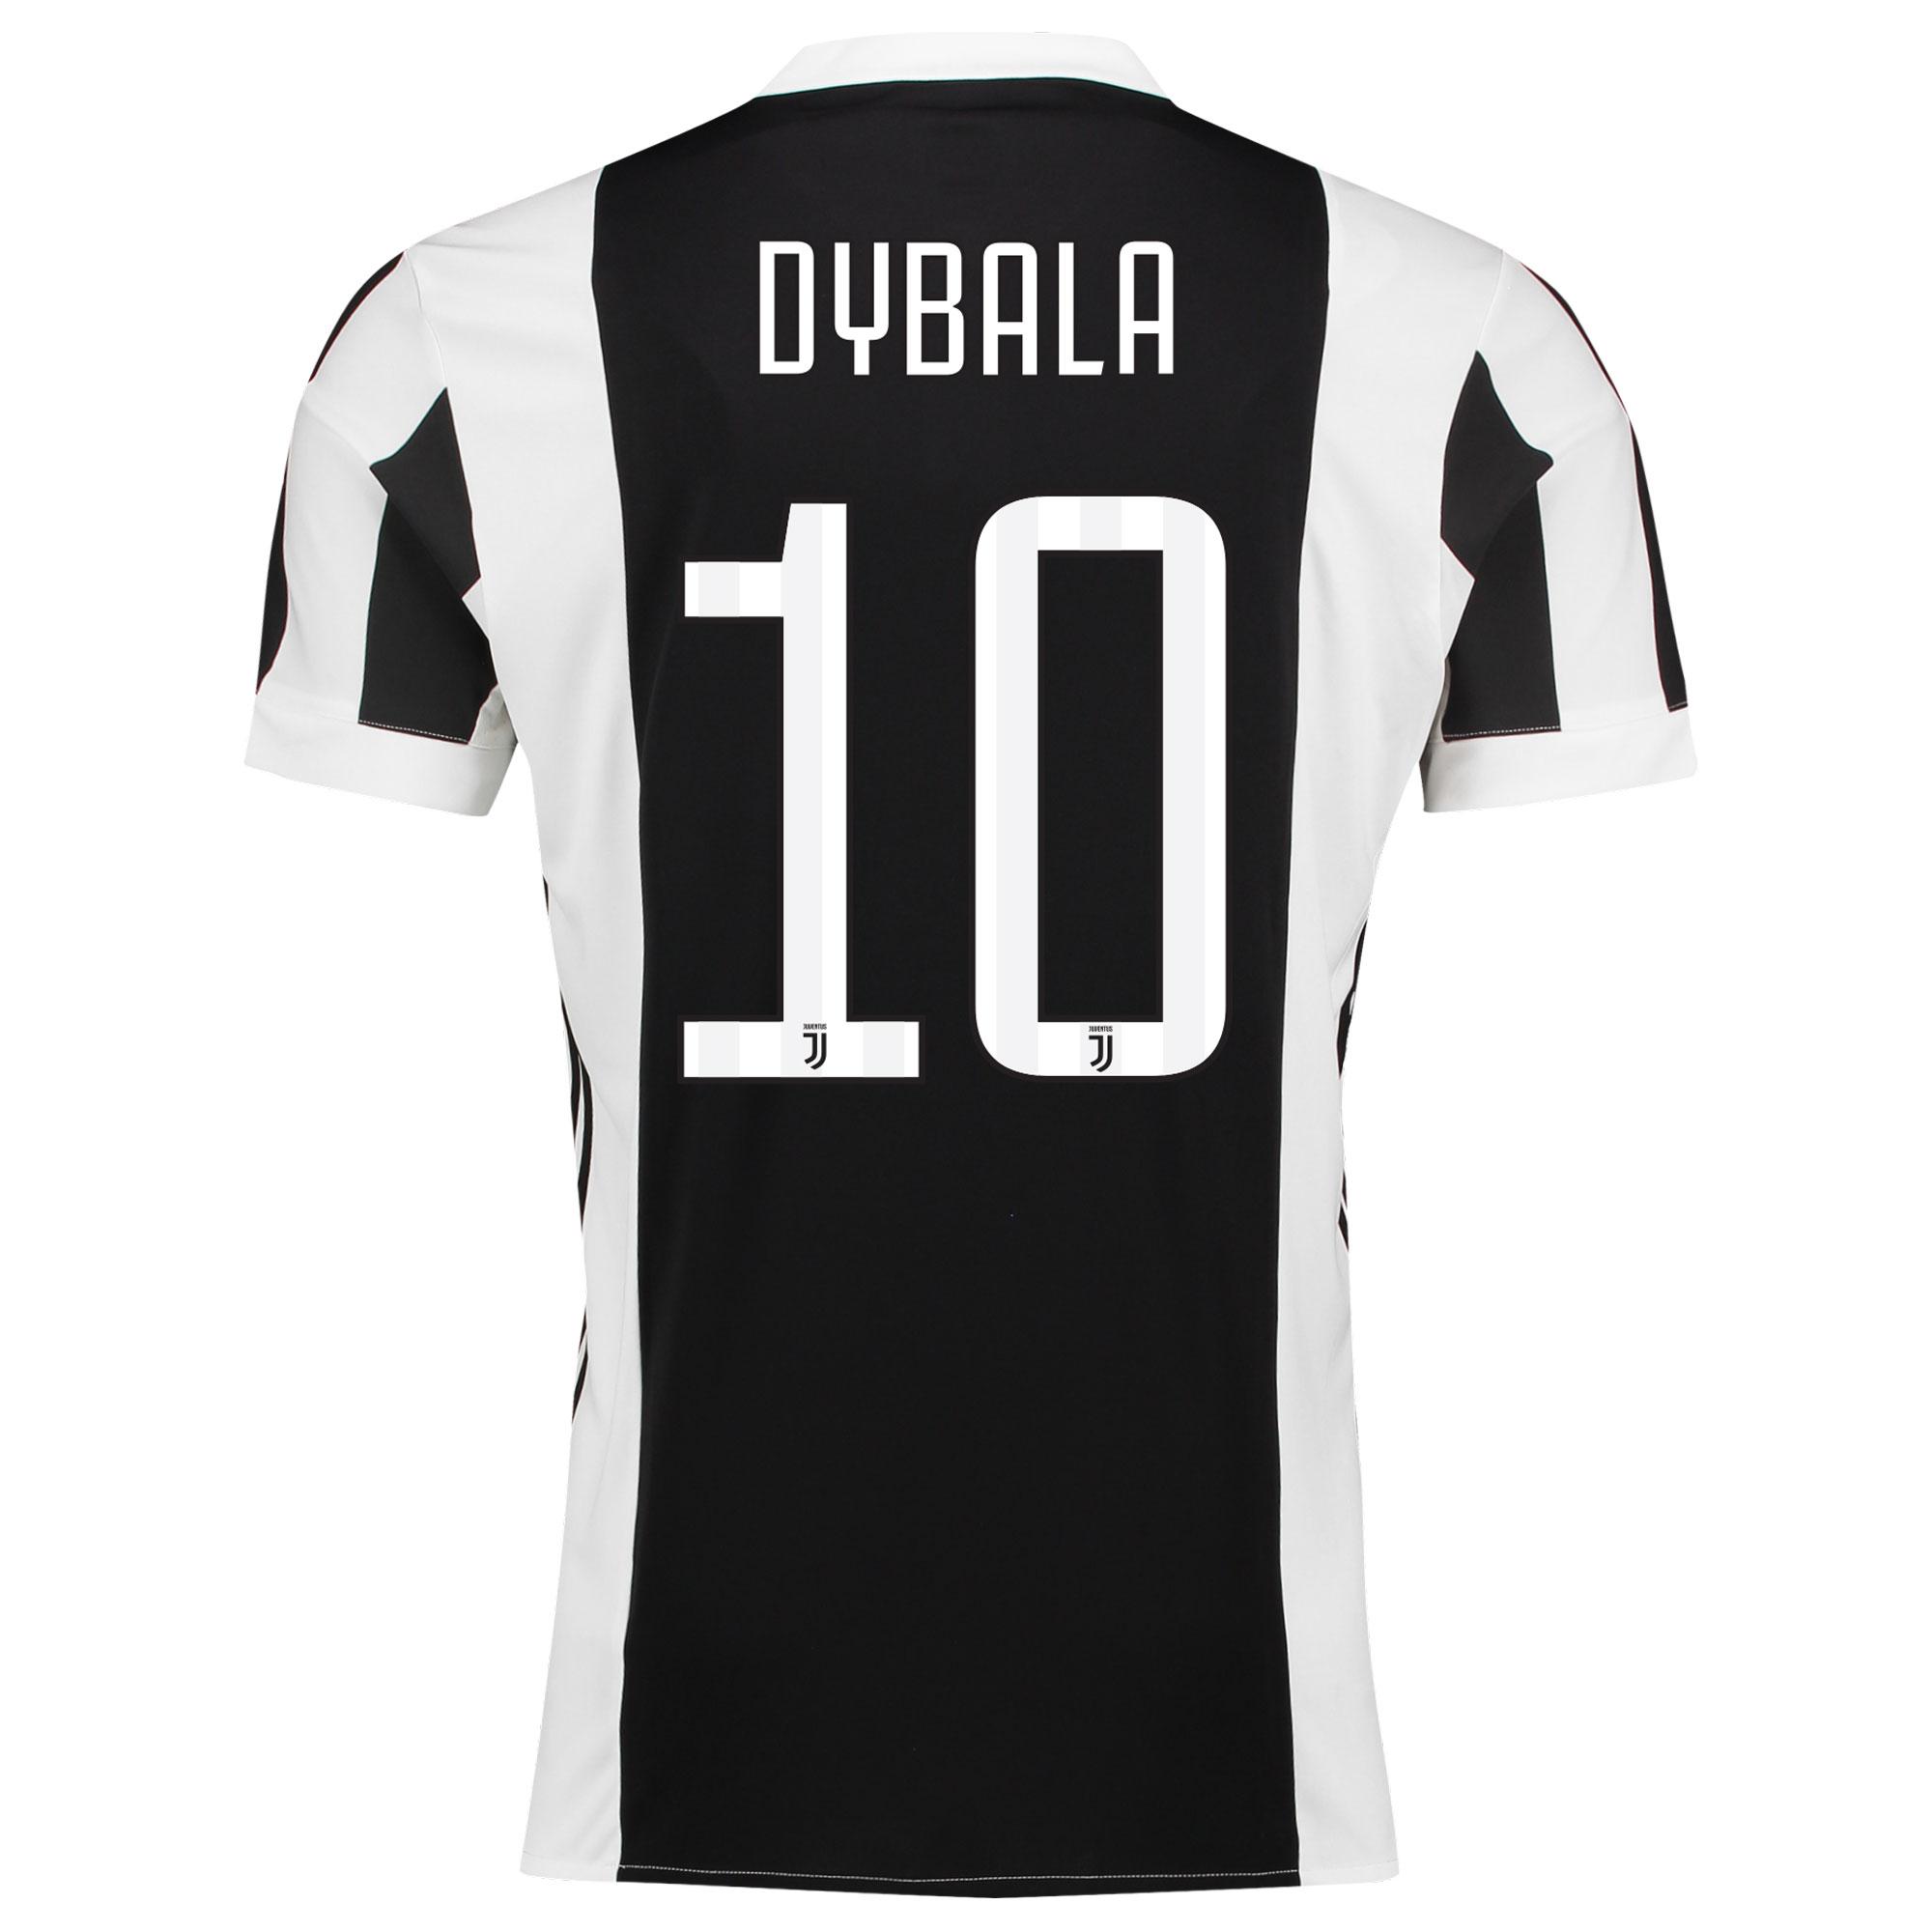 Juventus Home Adi Zero Shirt 2017-18 with Dybala 10 printing